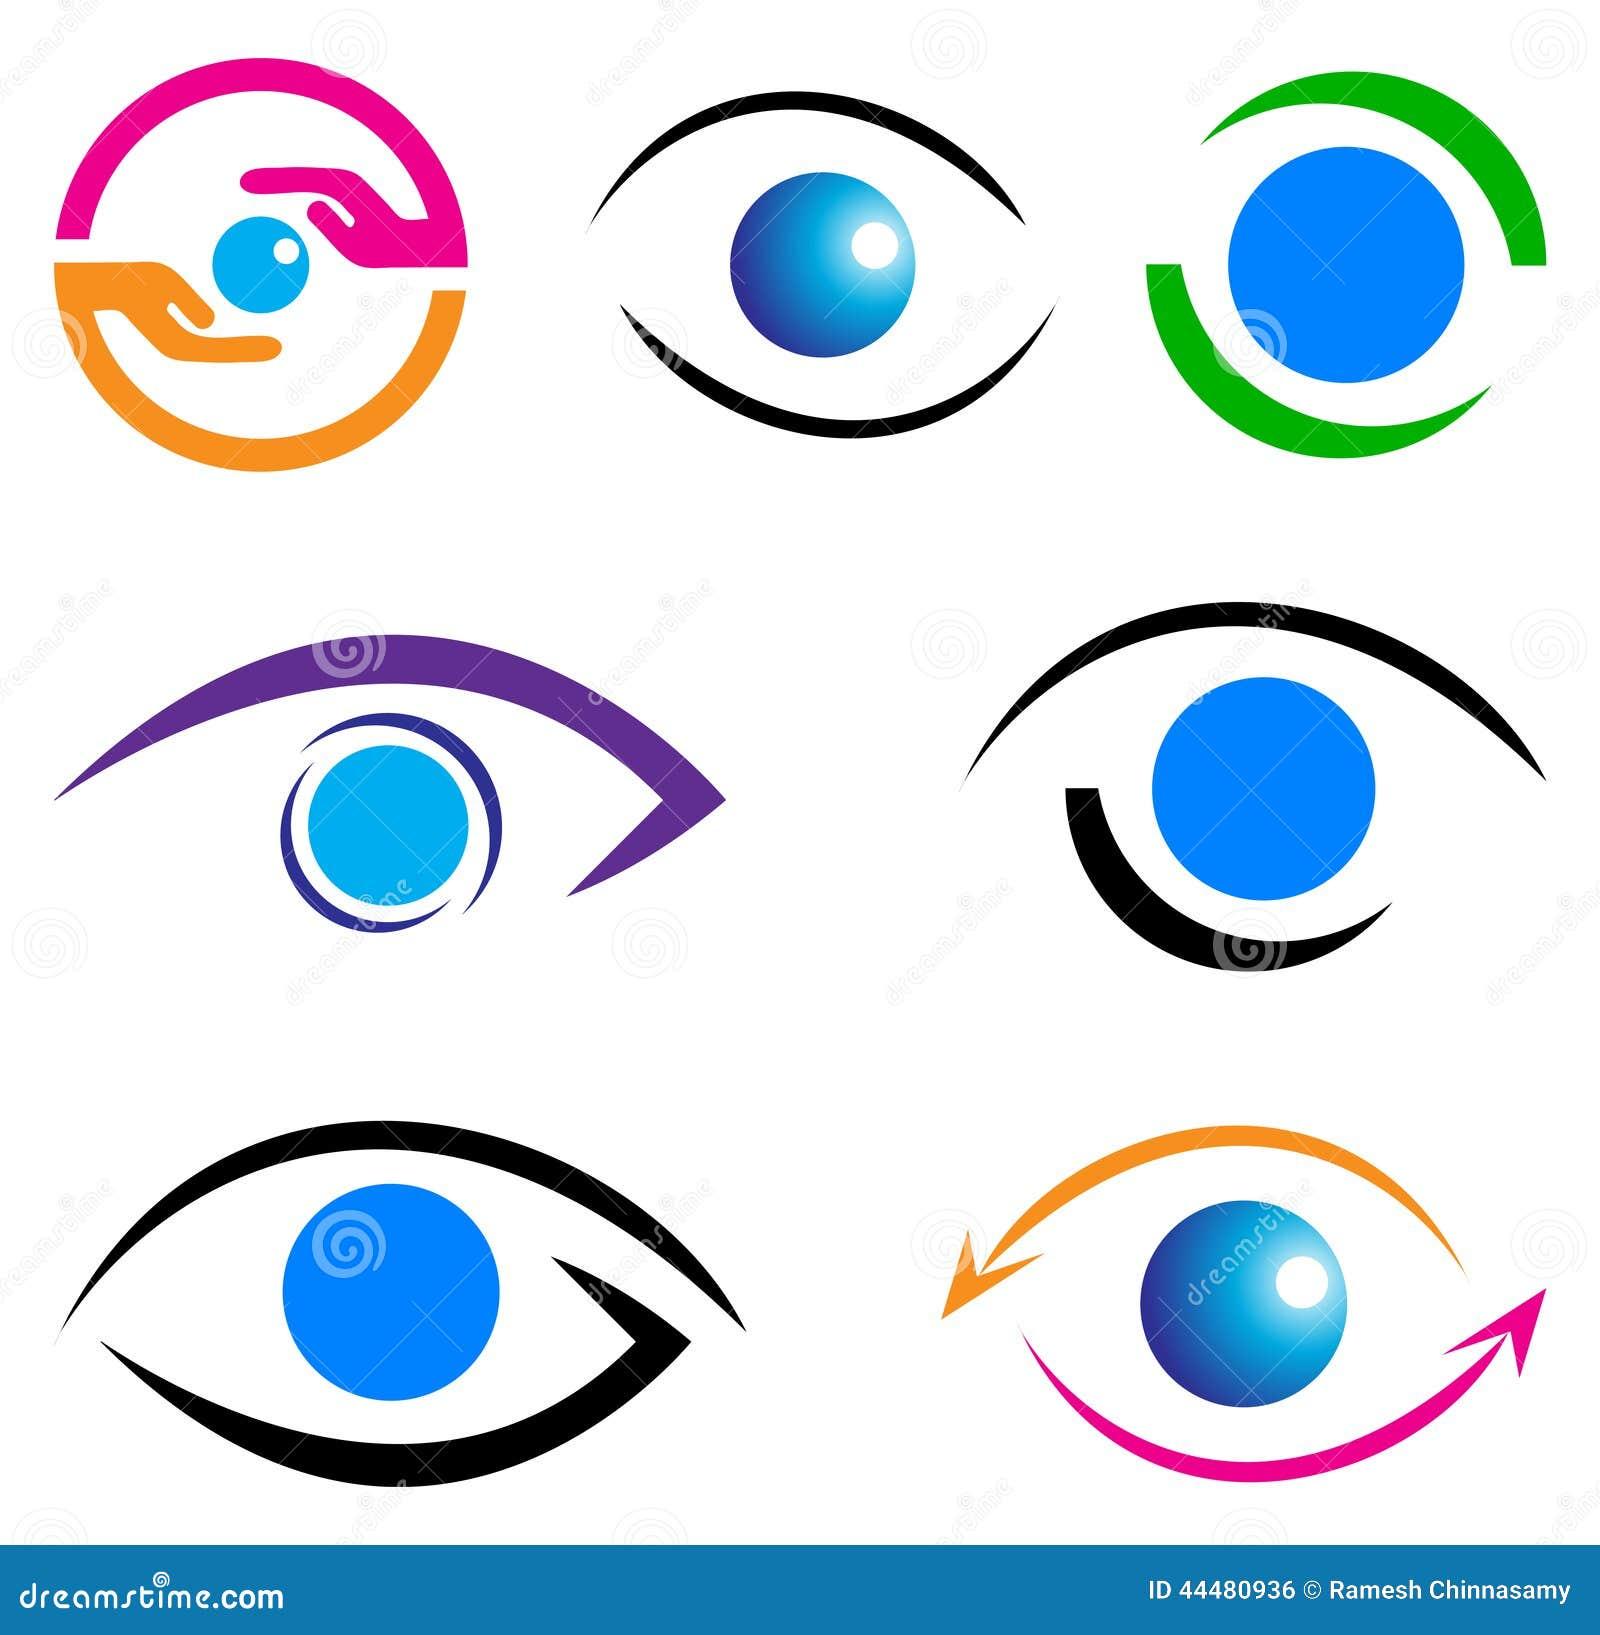 Eye care logo stock vector image 44480936 for Illustration minimaliste